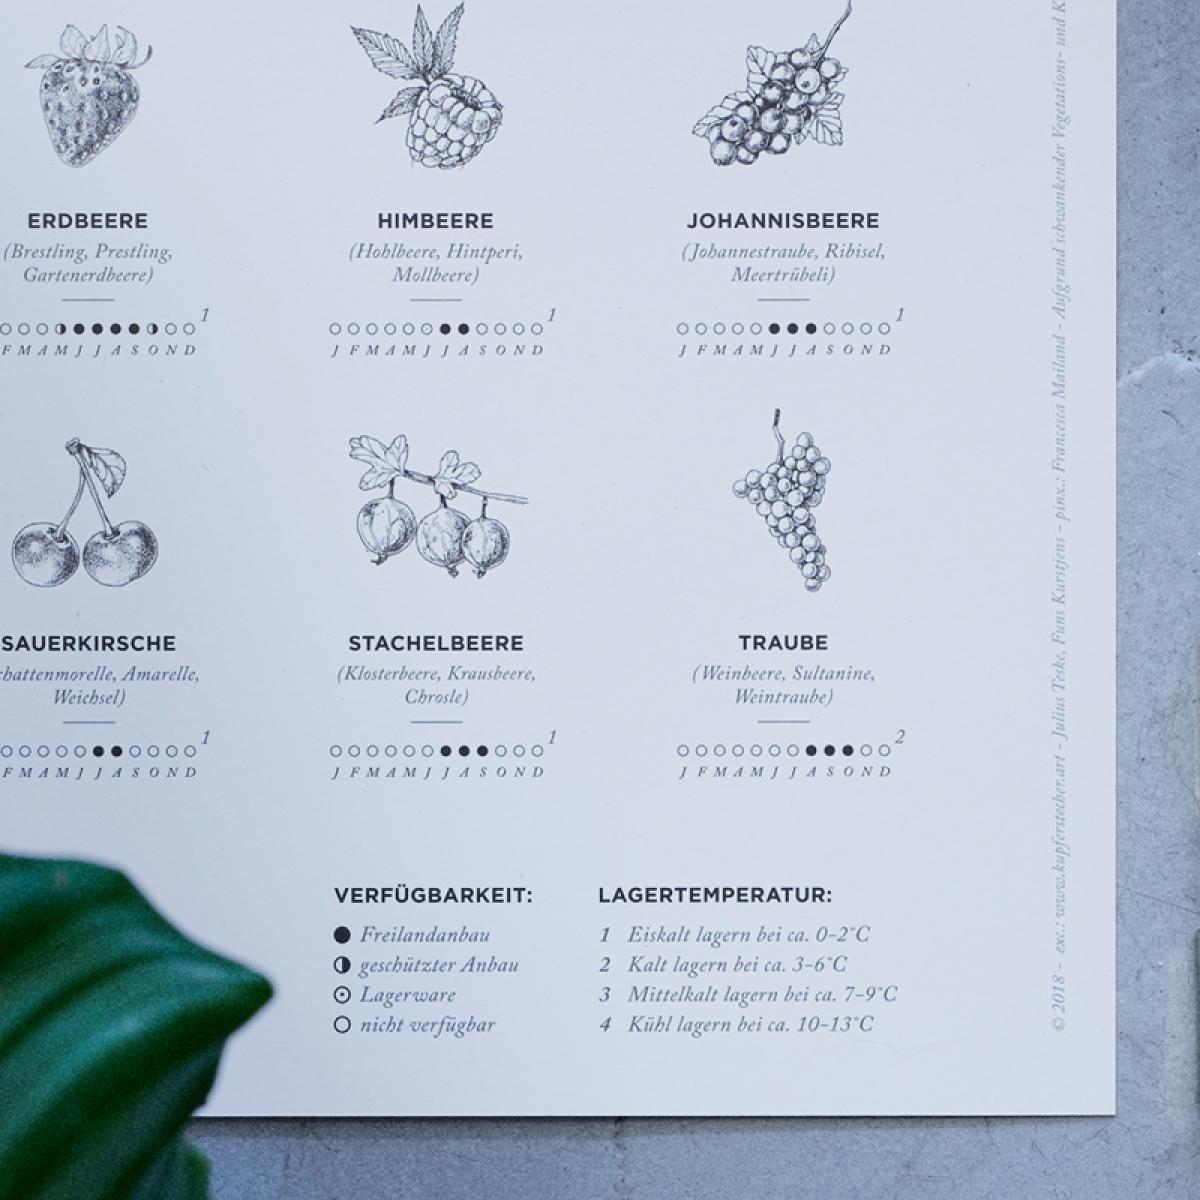 Kupferstecher.Art – Saisonkalender Obst & Gemüse Poster (erhältlich in Format A1, A2 und A3)